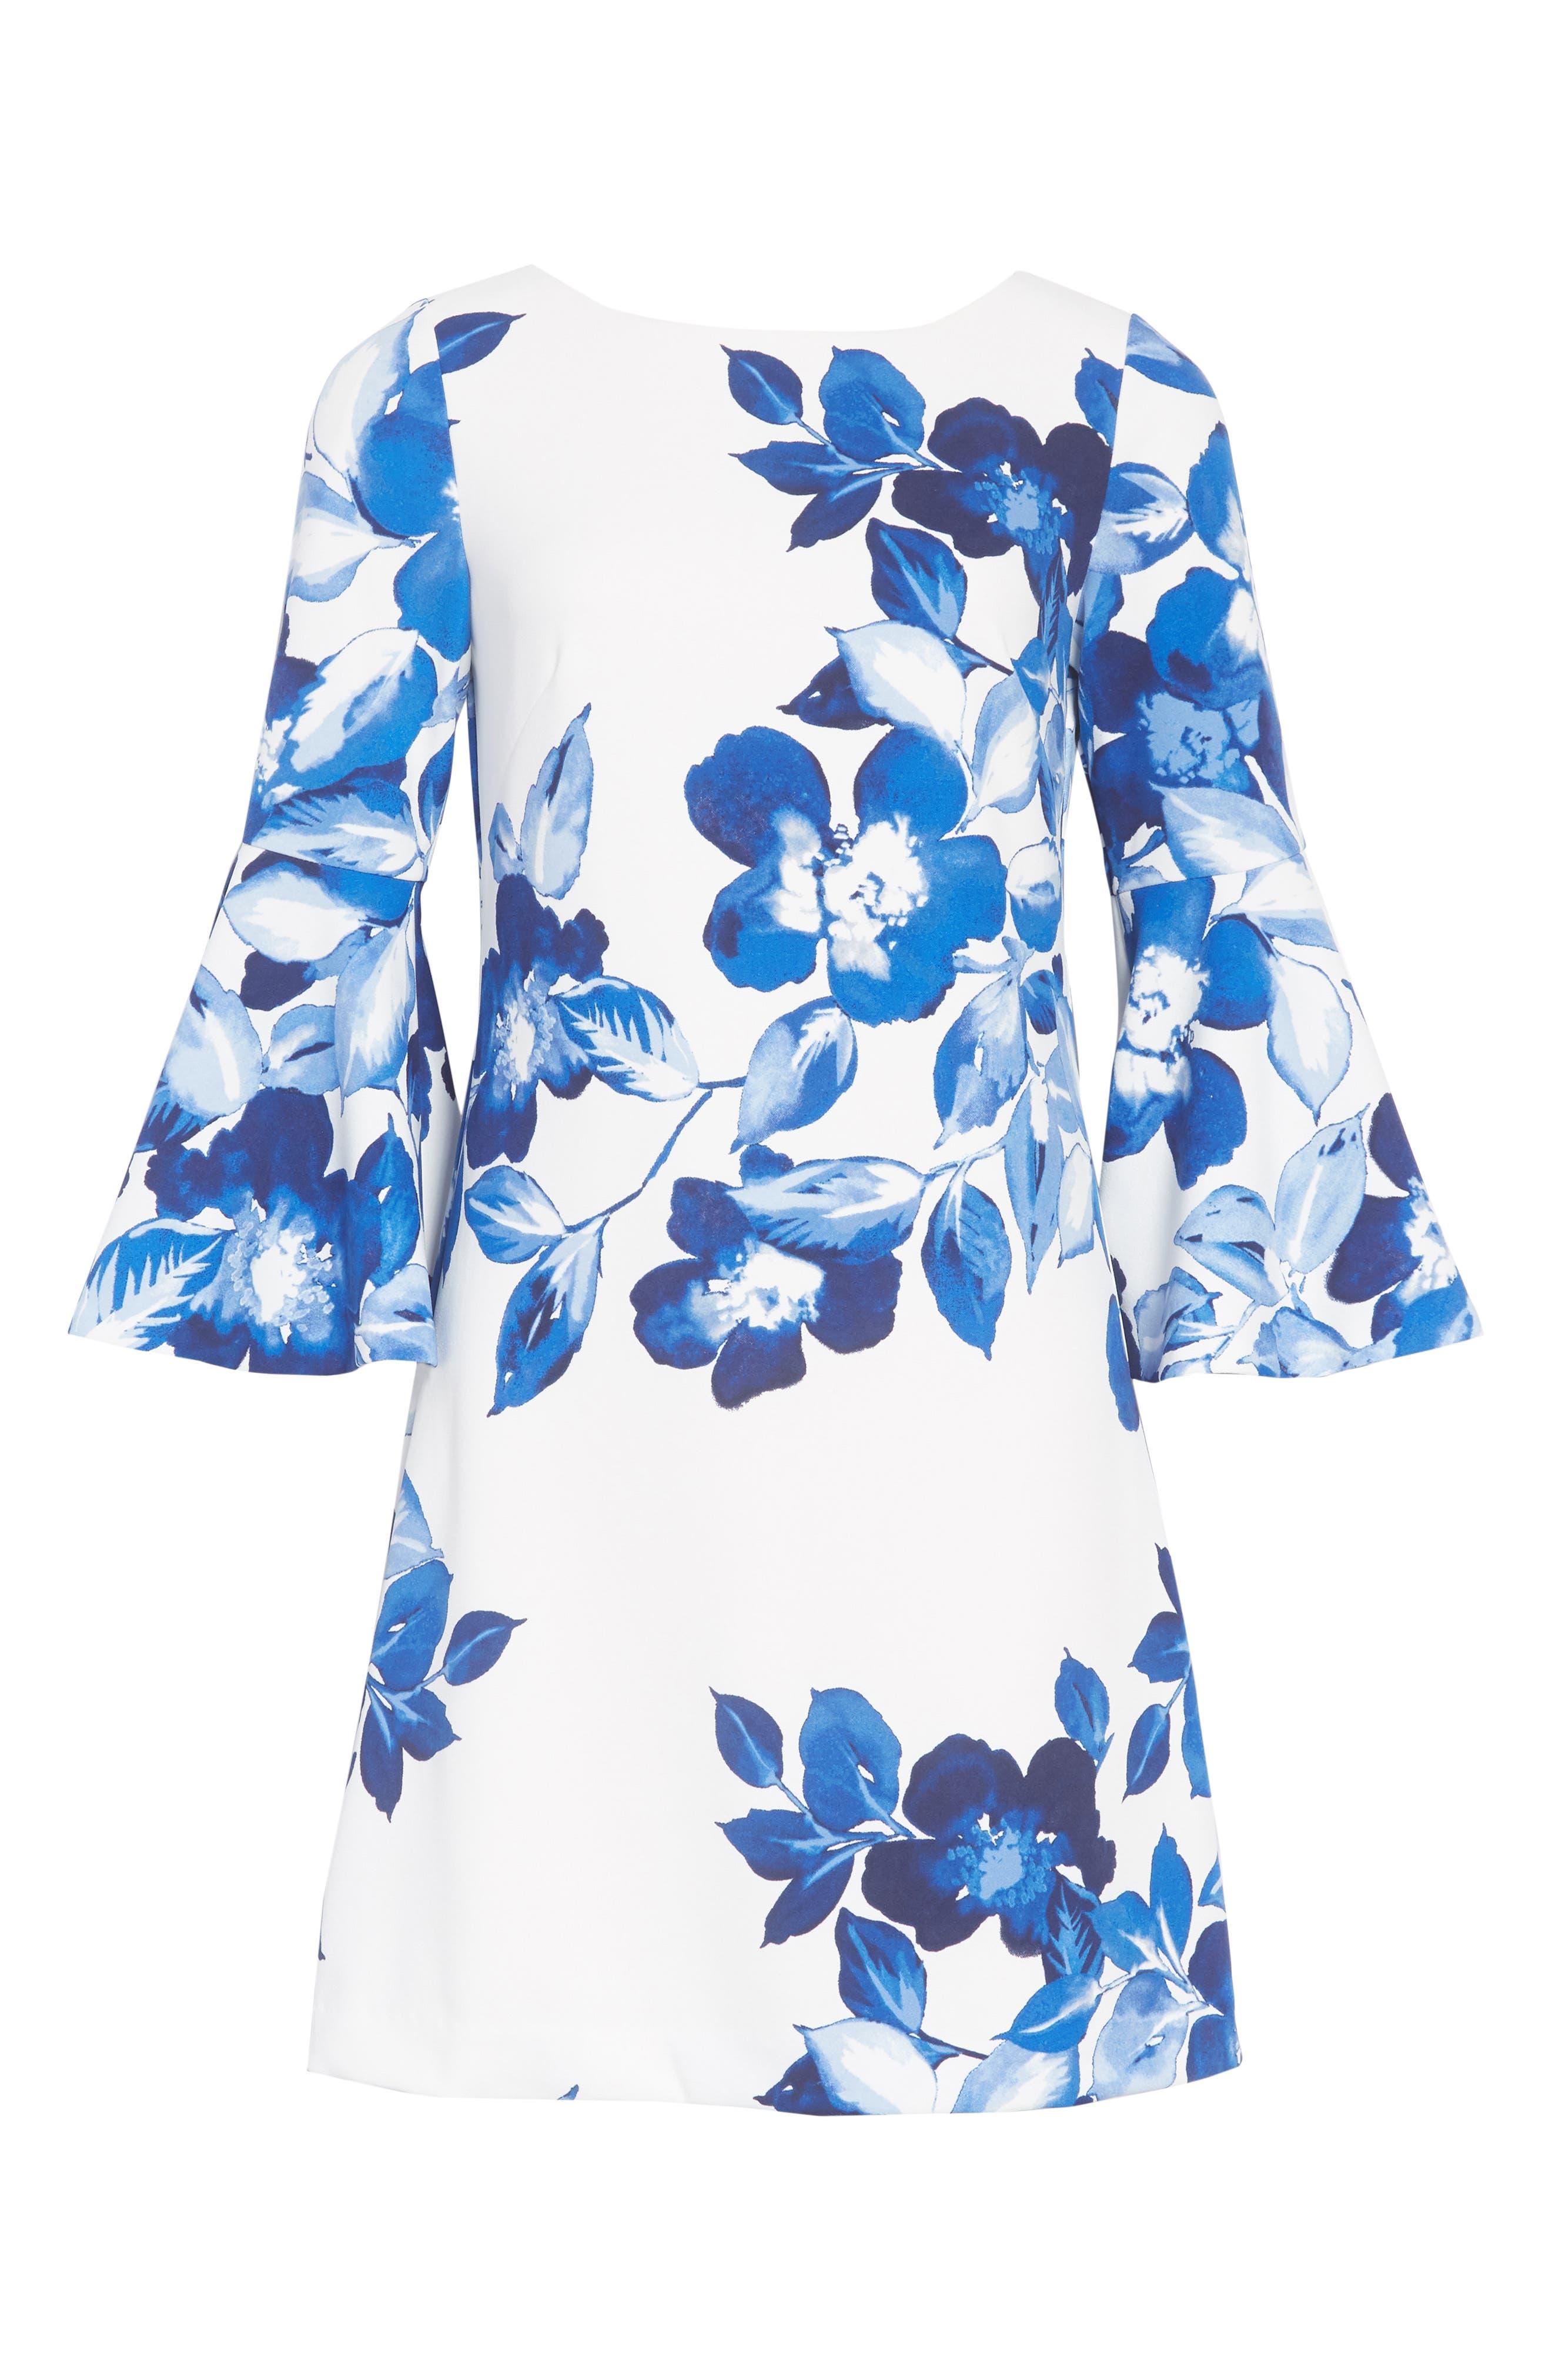 Floral Shift Dress,                             Alternate thumbnail 8, color,                             BLUE/ IVORY